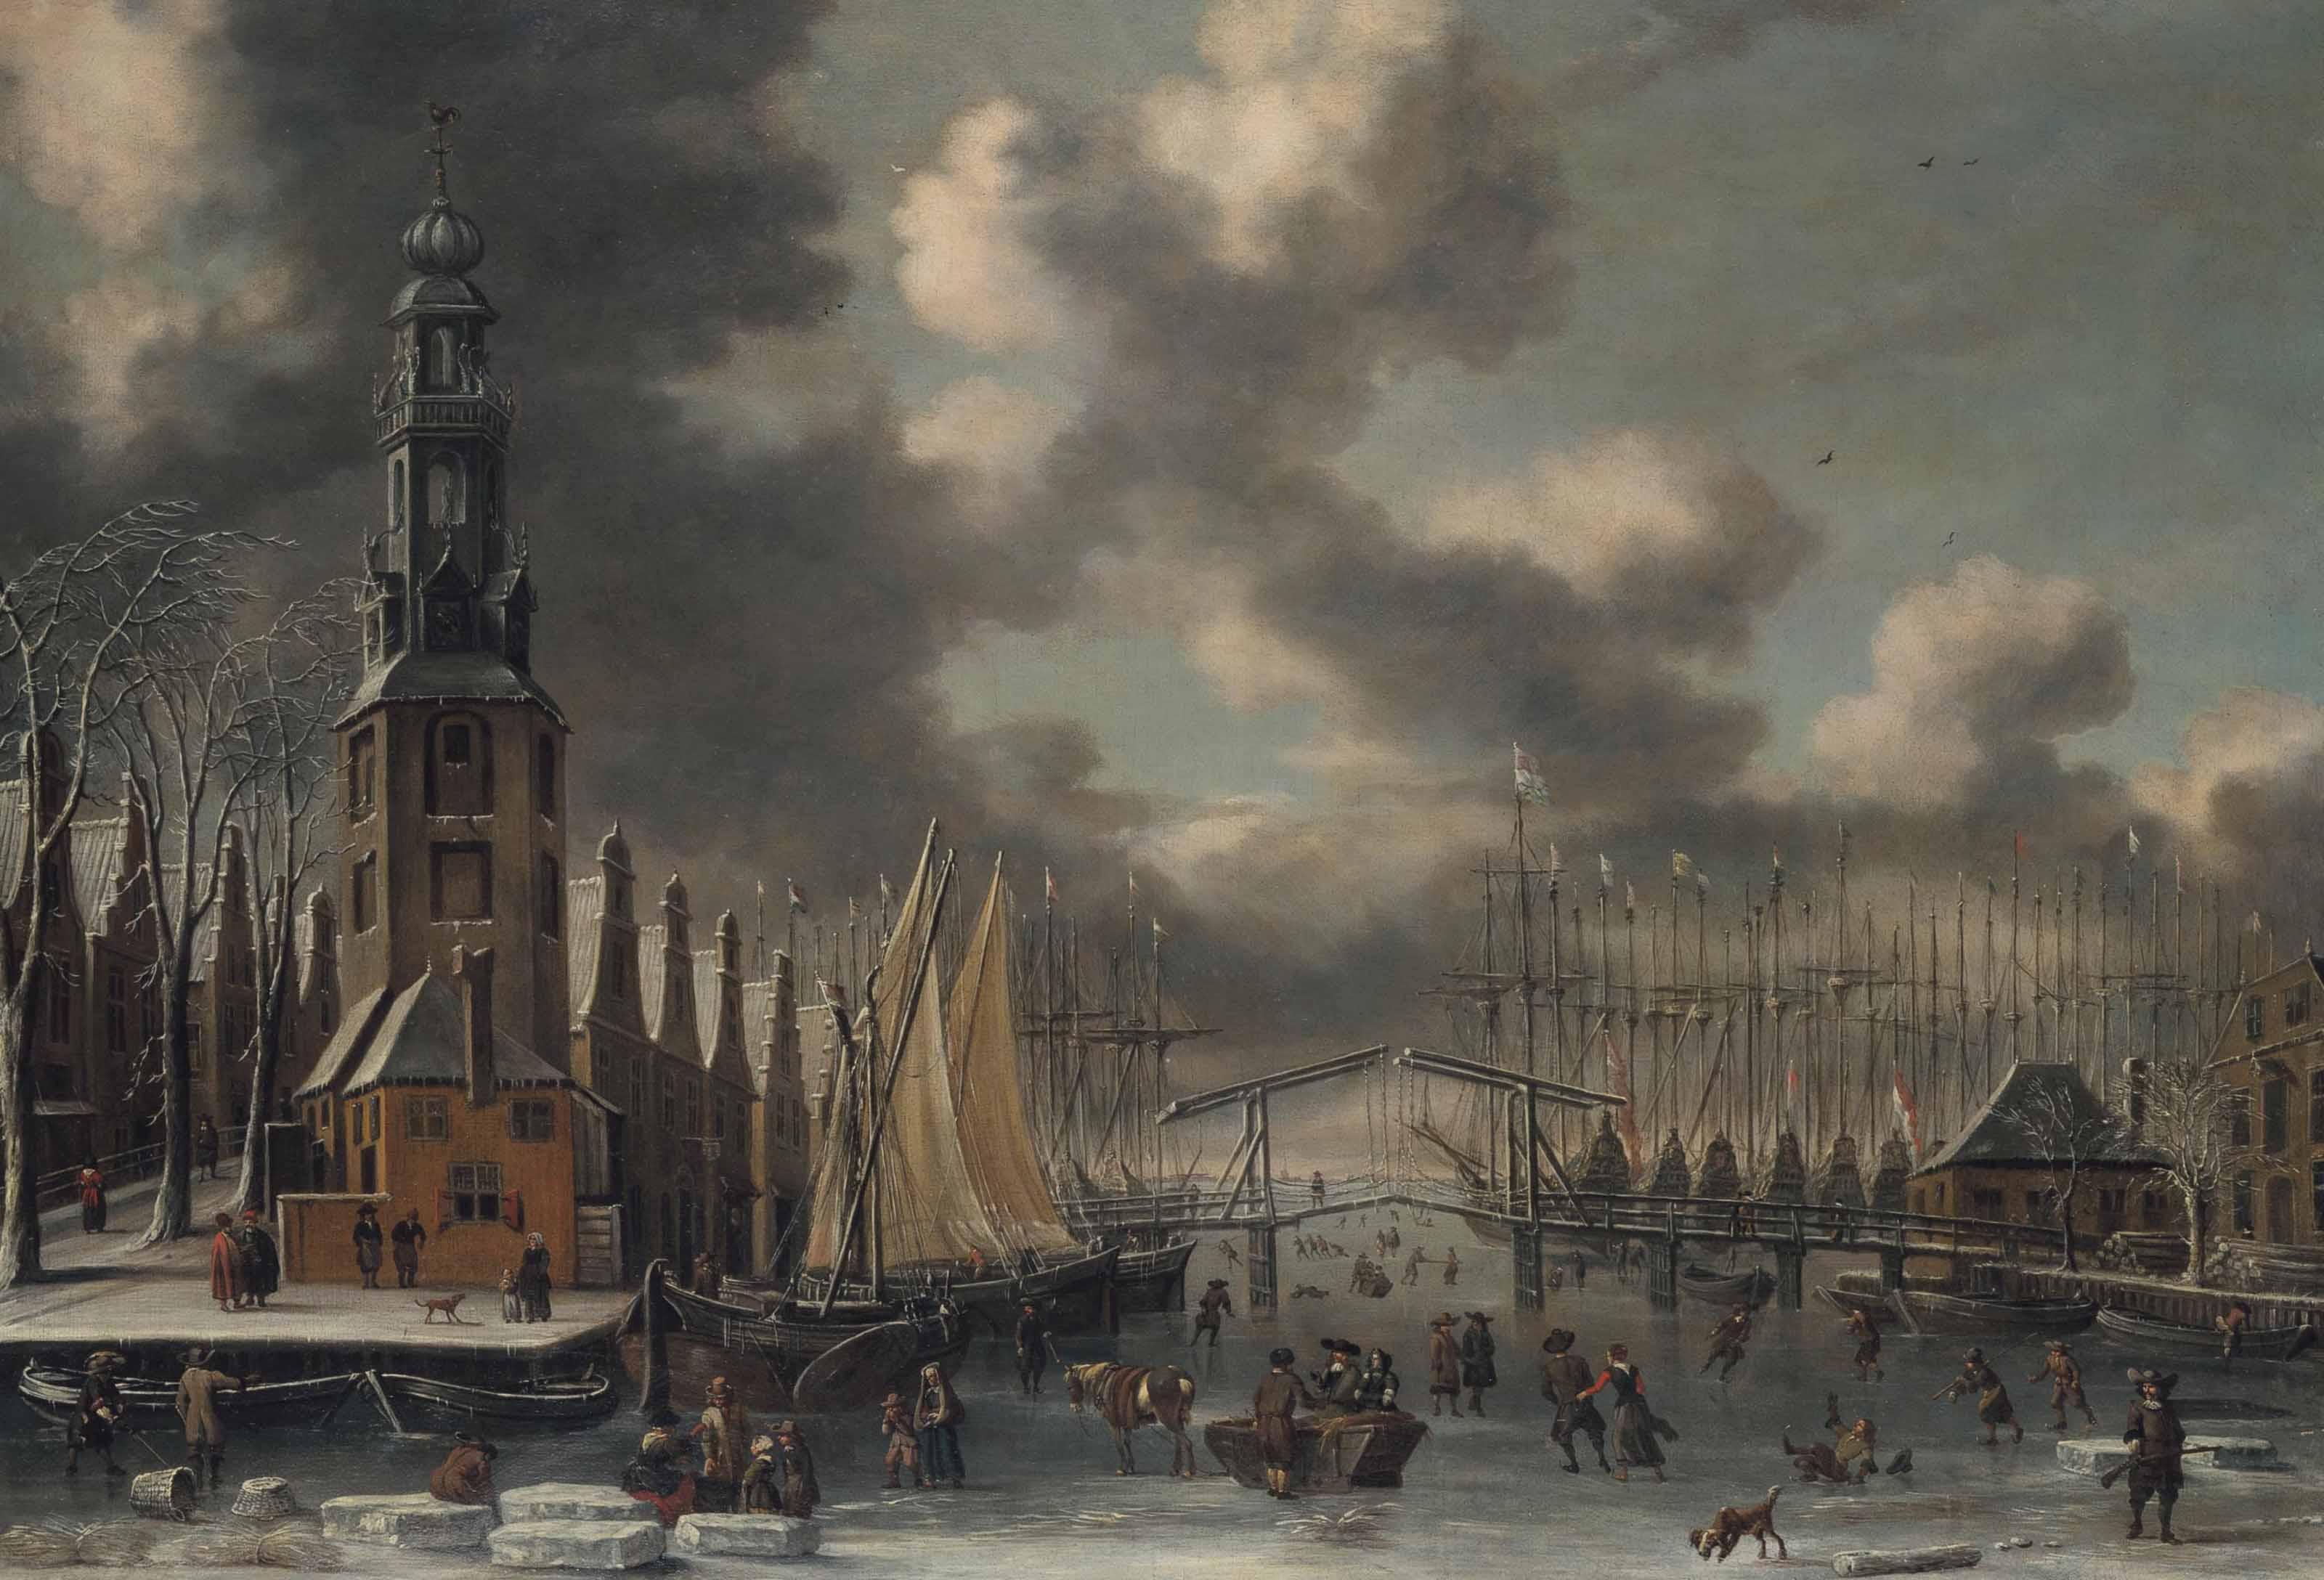 Thomas Heeremans (Haarlem 1641-1697) and Abraham Storck (Amsterdam 1644-1708)